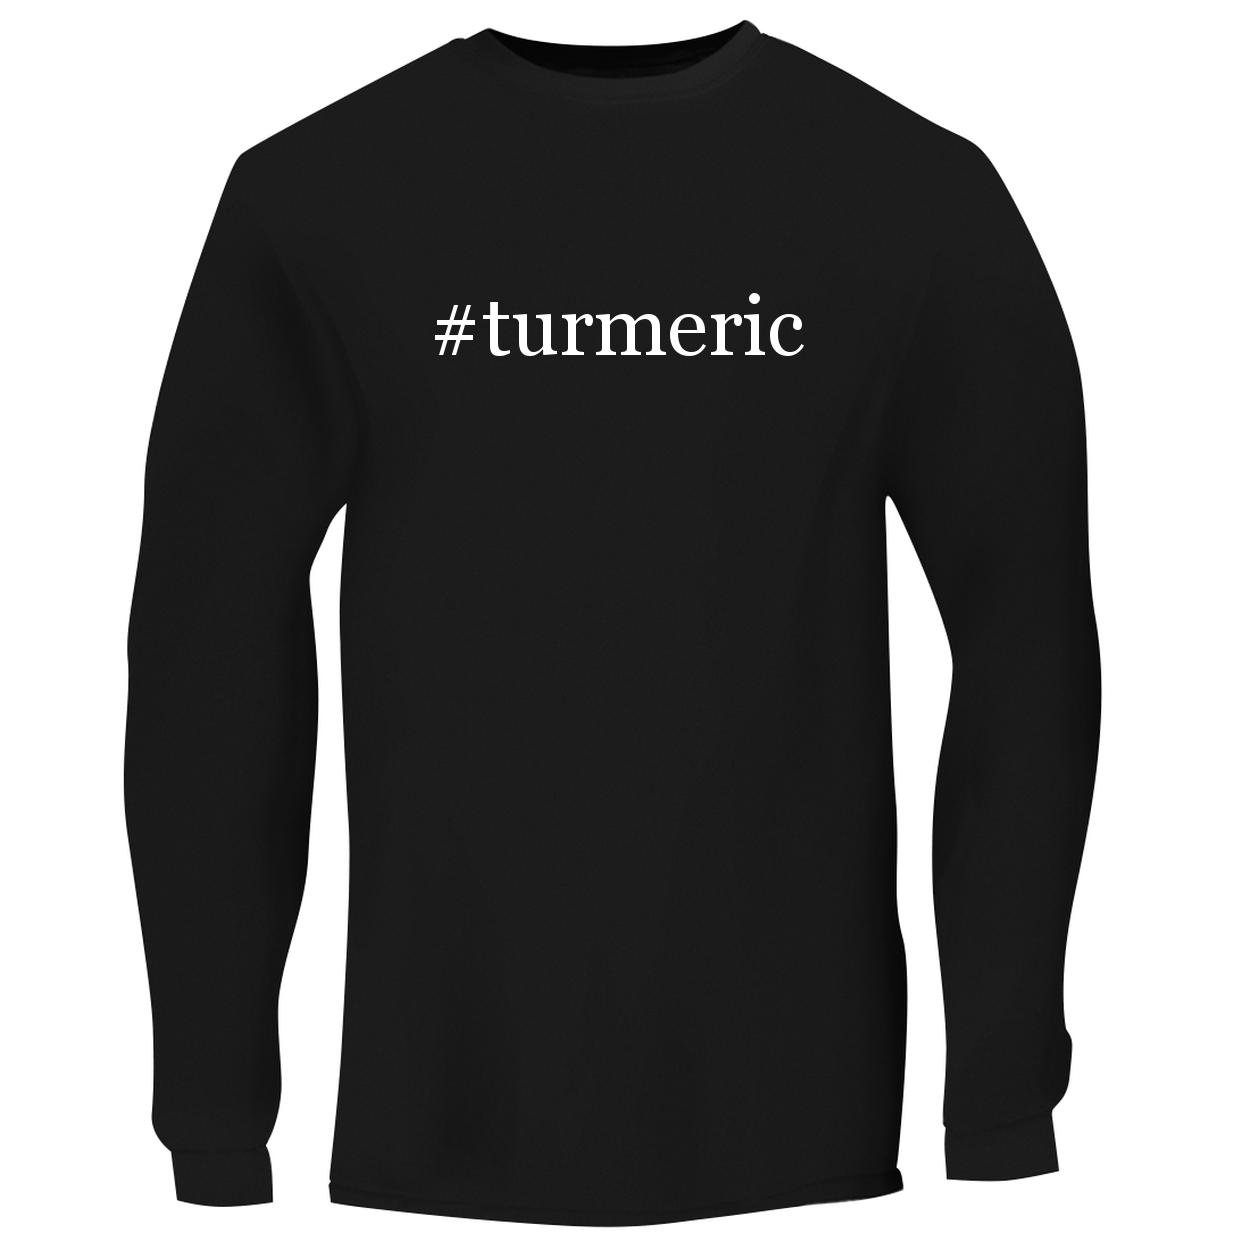 2de8eede96 Amazon.com  BH Cool Designs  Turmeric - Men s Long Sleeve Graphic Tee   Clothing